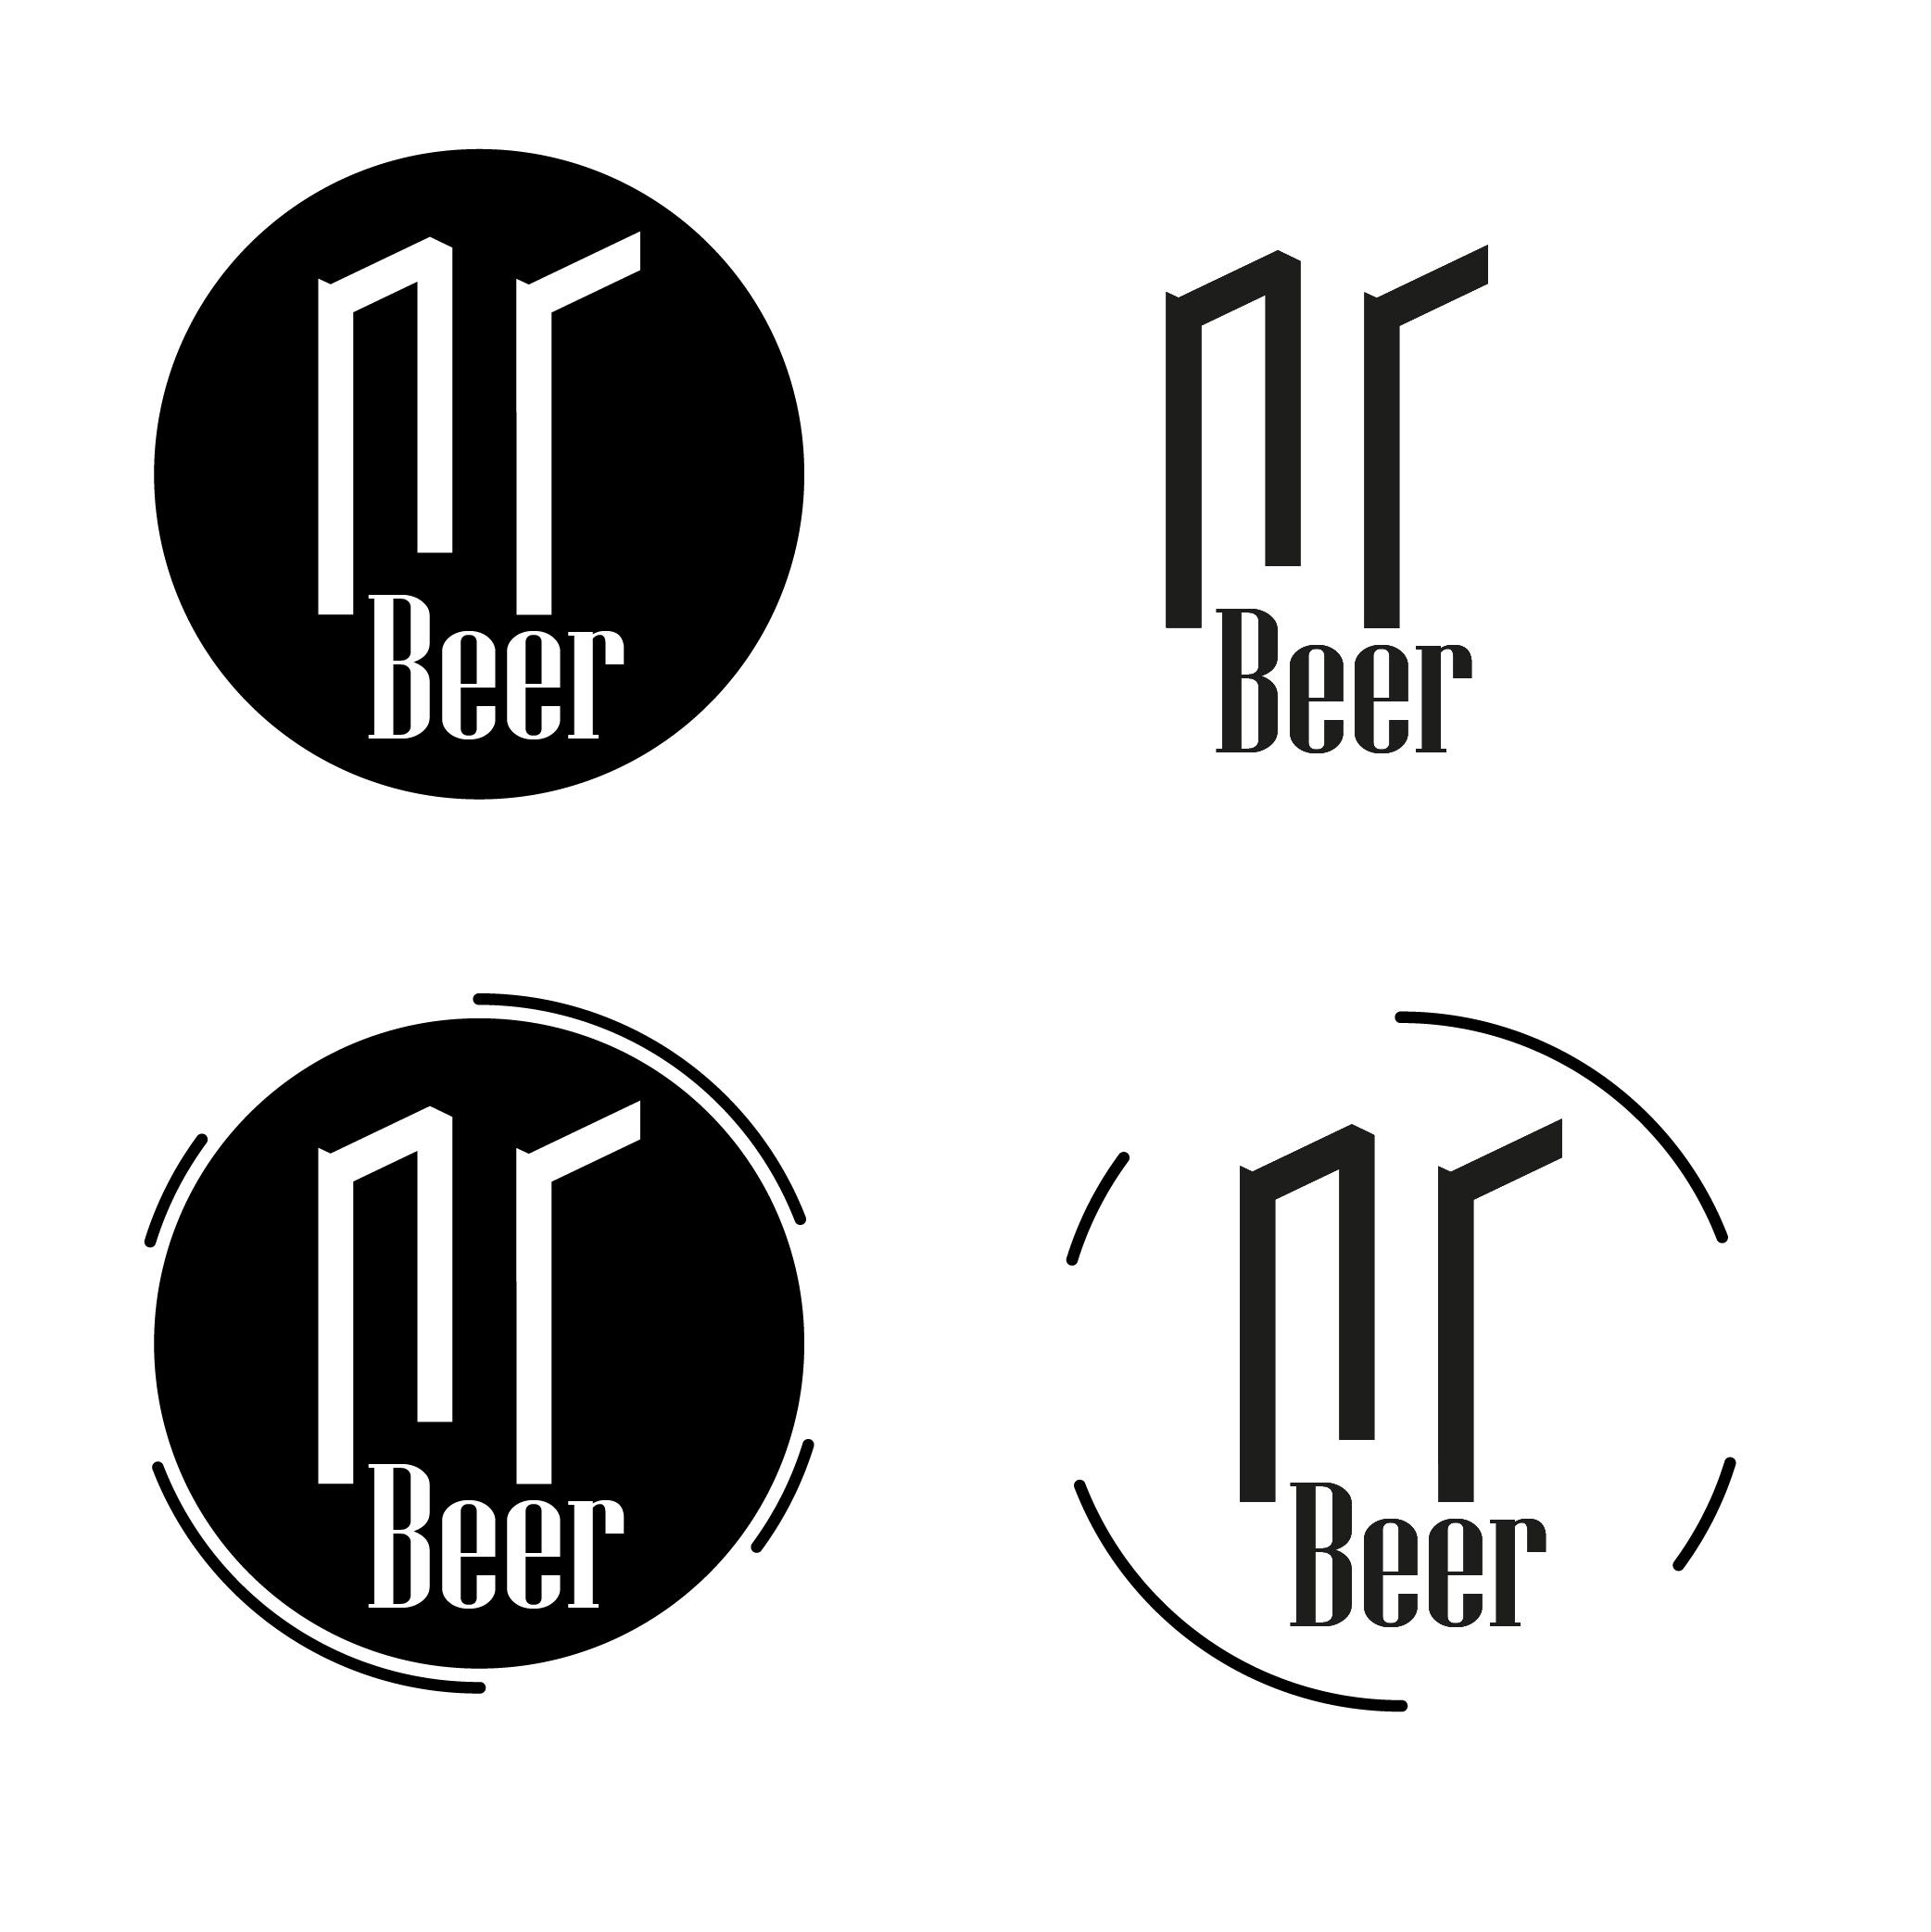 Логотип для Крафтовой Пивоварни фото f_3605caed71e6ae31.jpg